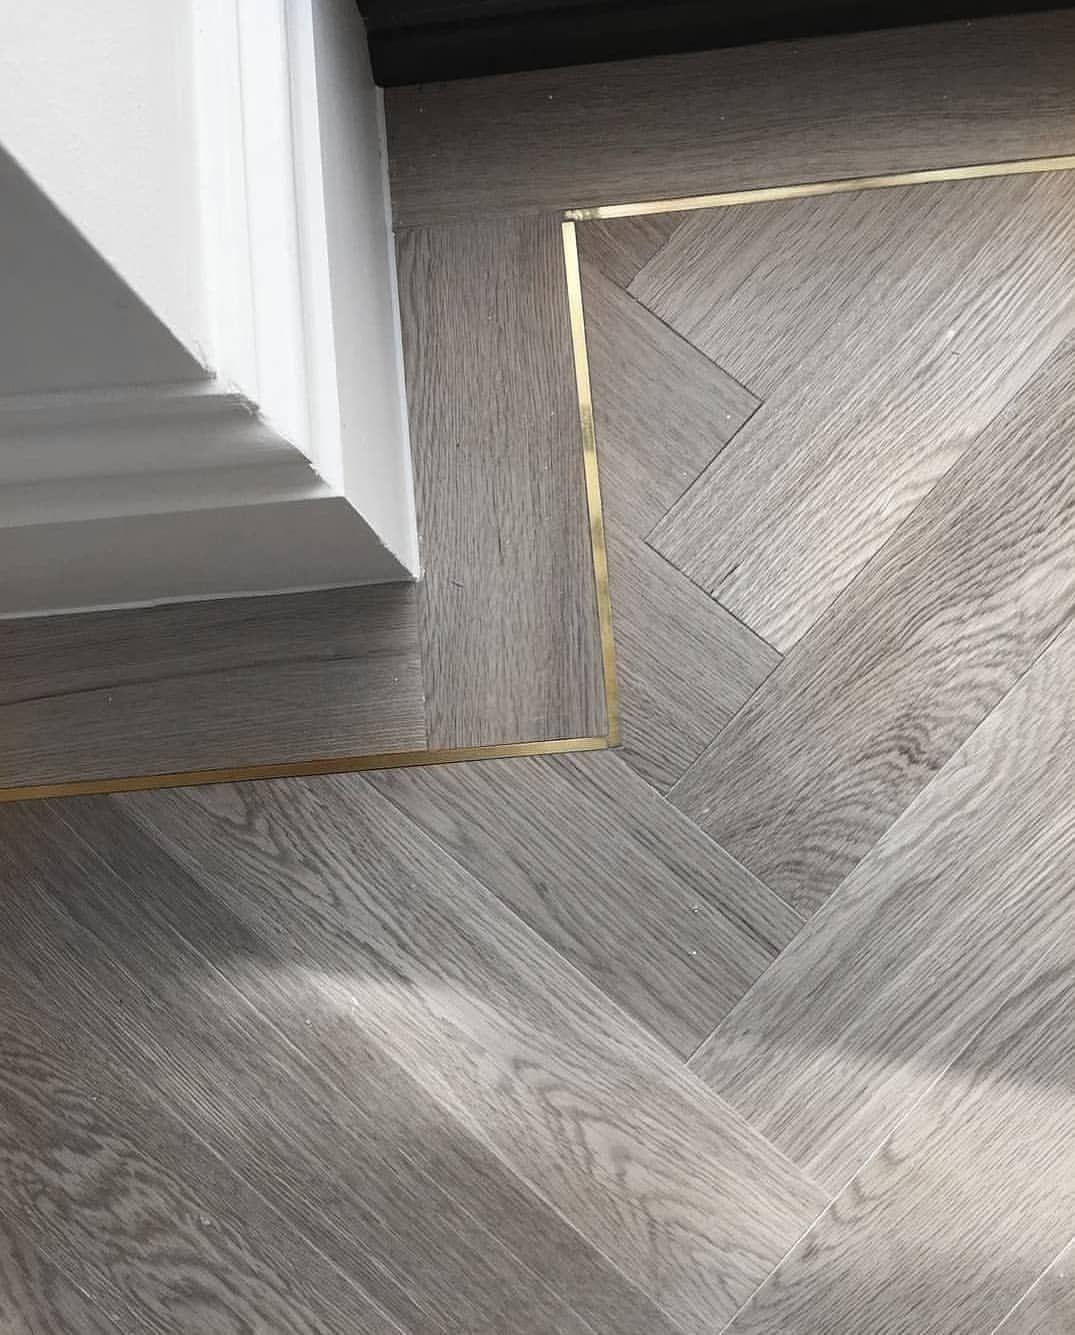 Rustic Hardwood Flooring Tips And Suggestion: 8 Miraculous Tips: Garage Flooring Flakes Dark Flooring